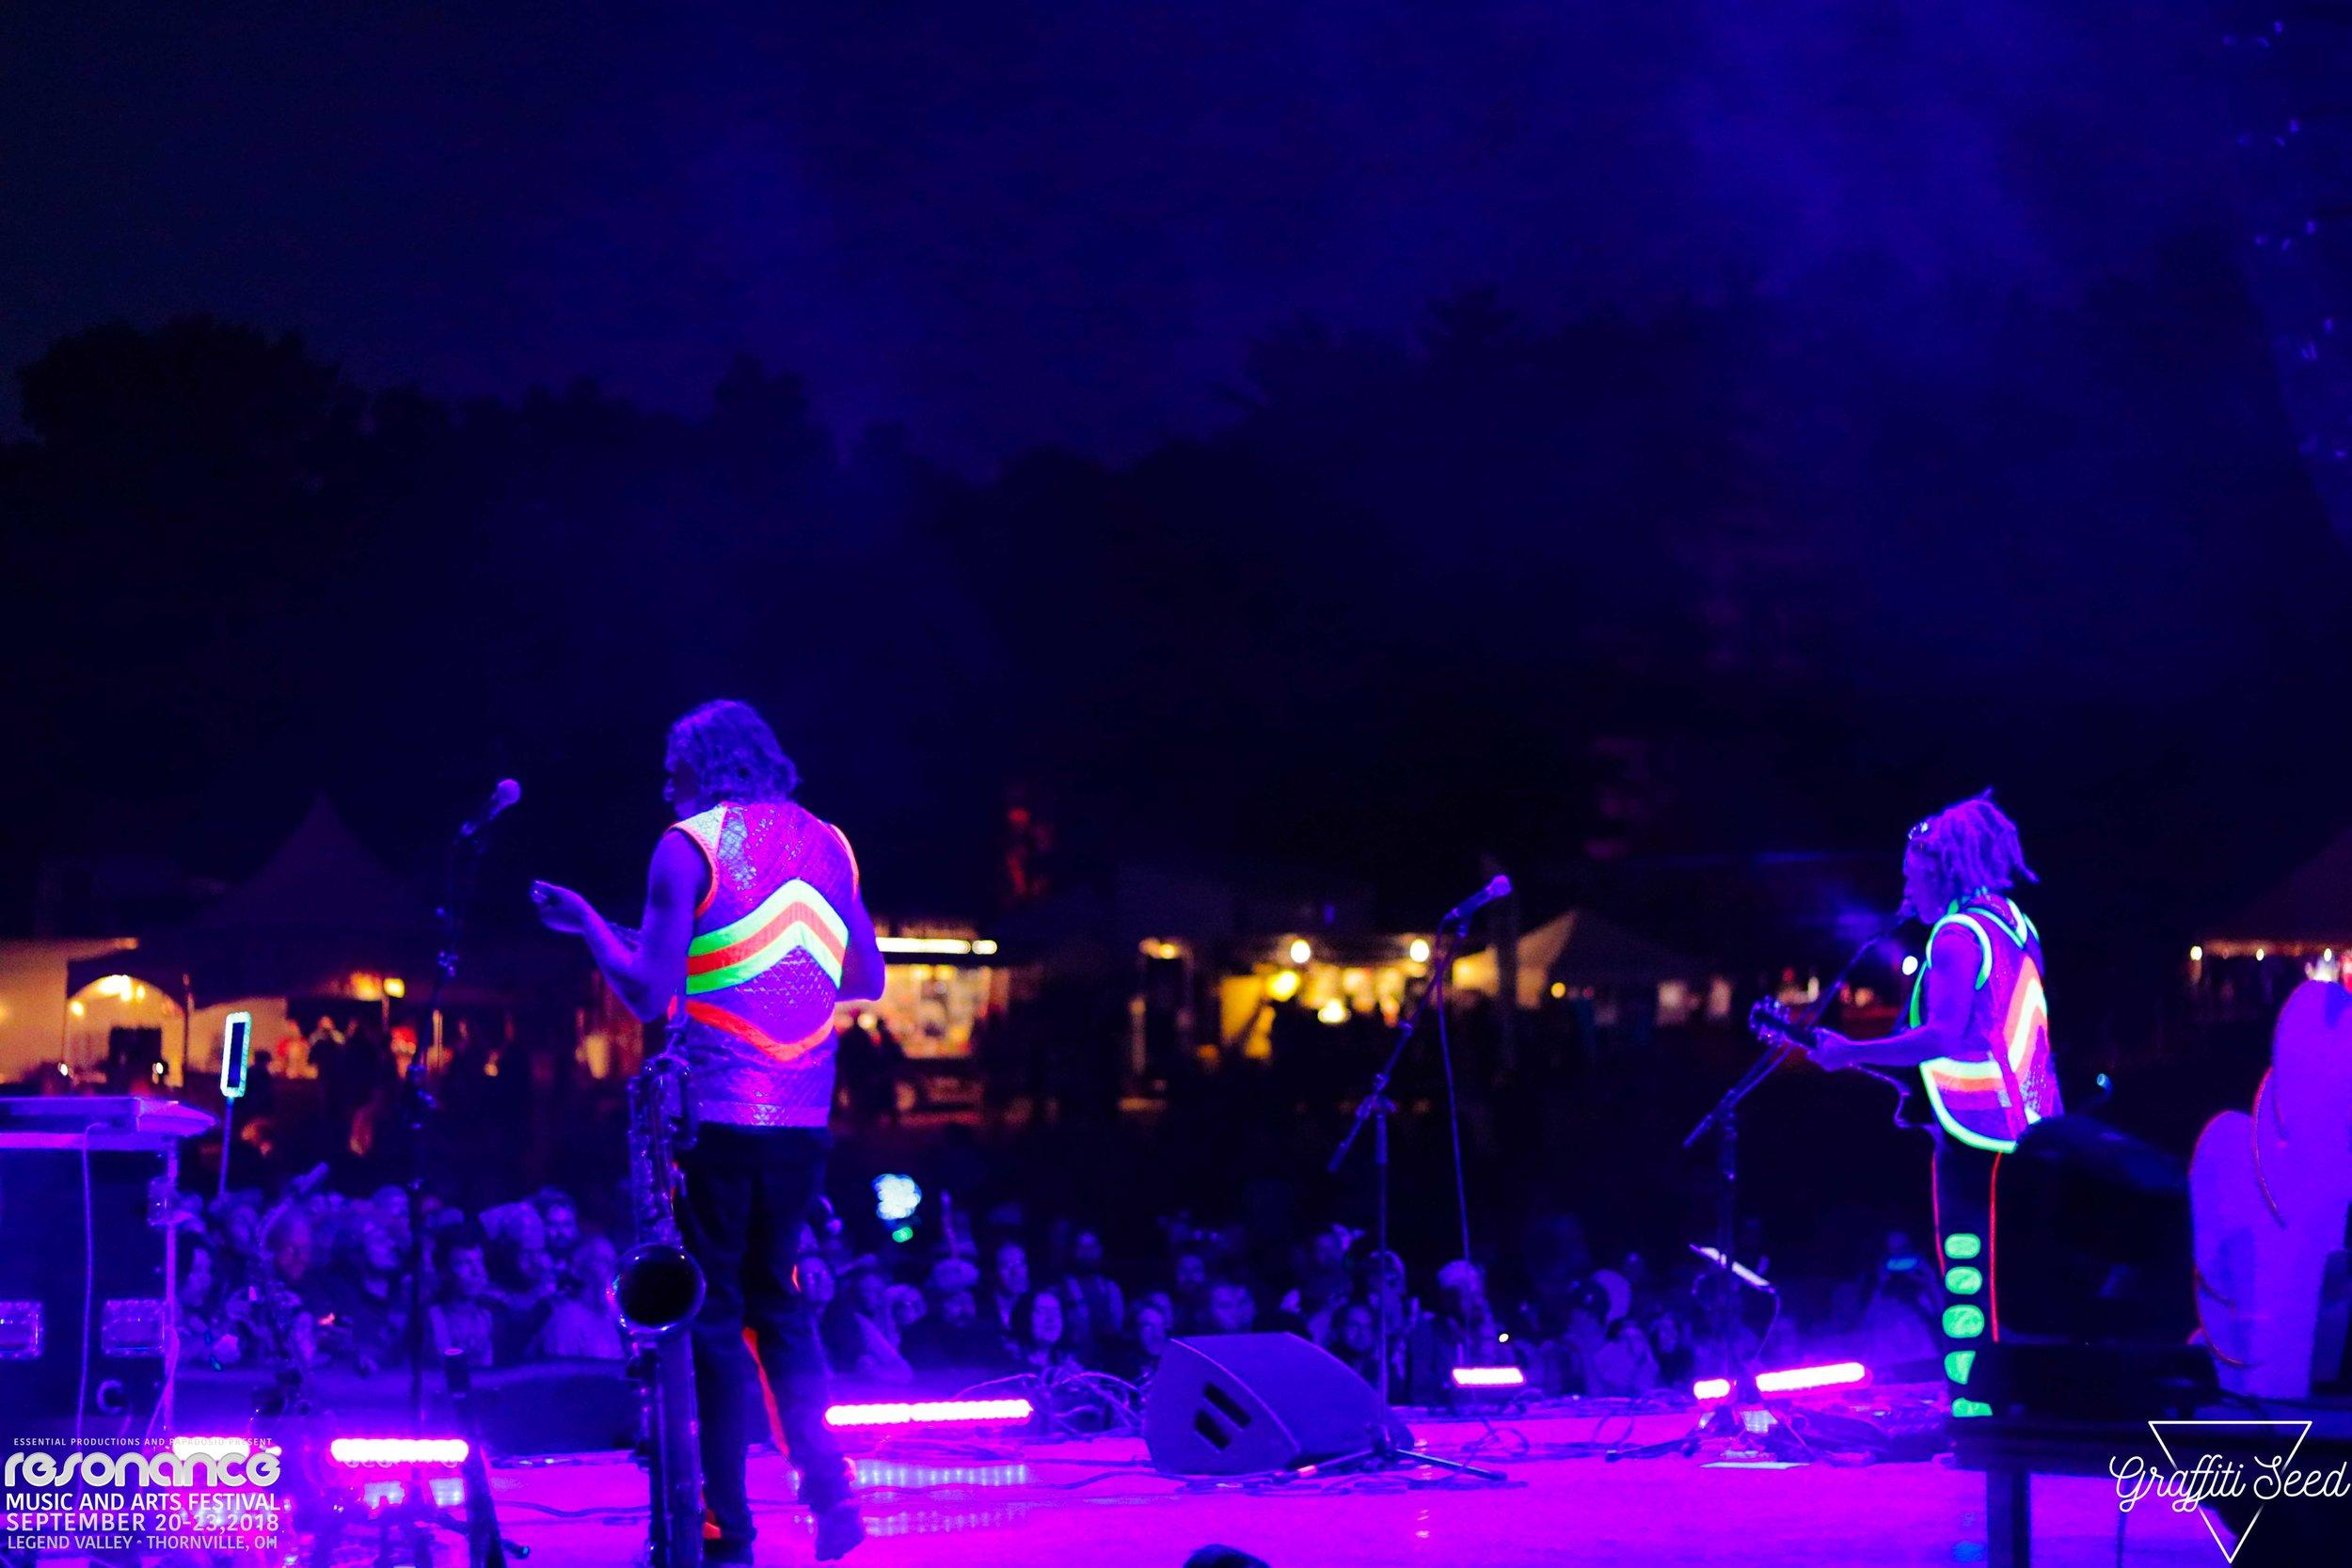 WOOKIEFOOT _ Resonance Music Festival 2018 _ www.GraffitiSeed.com 1.jpg